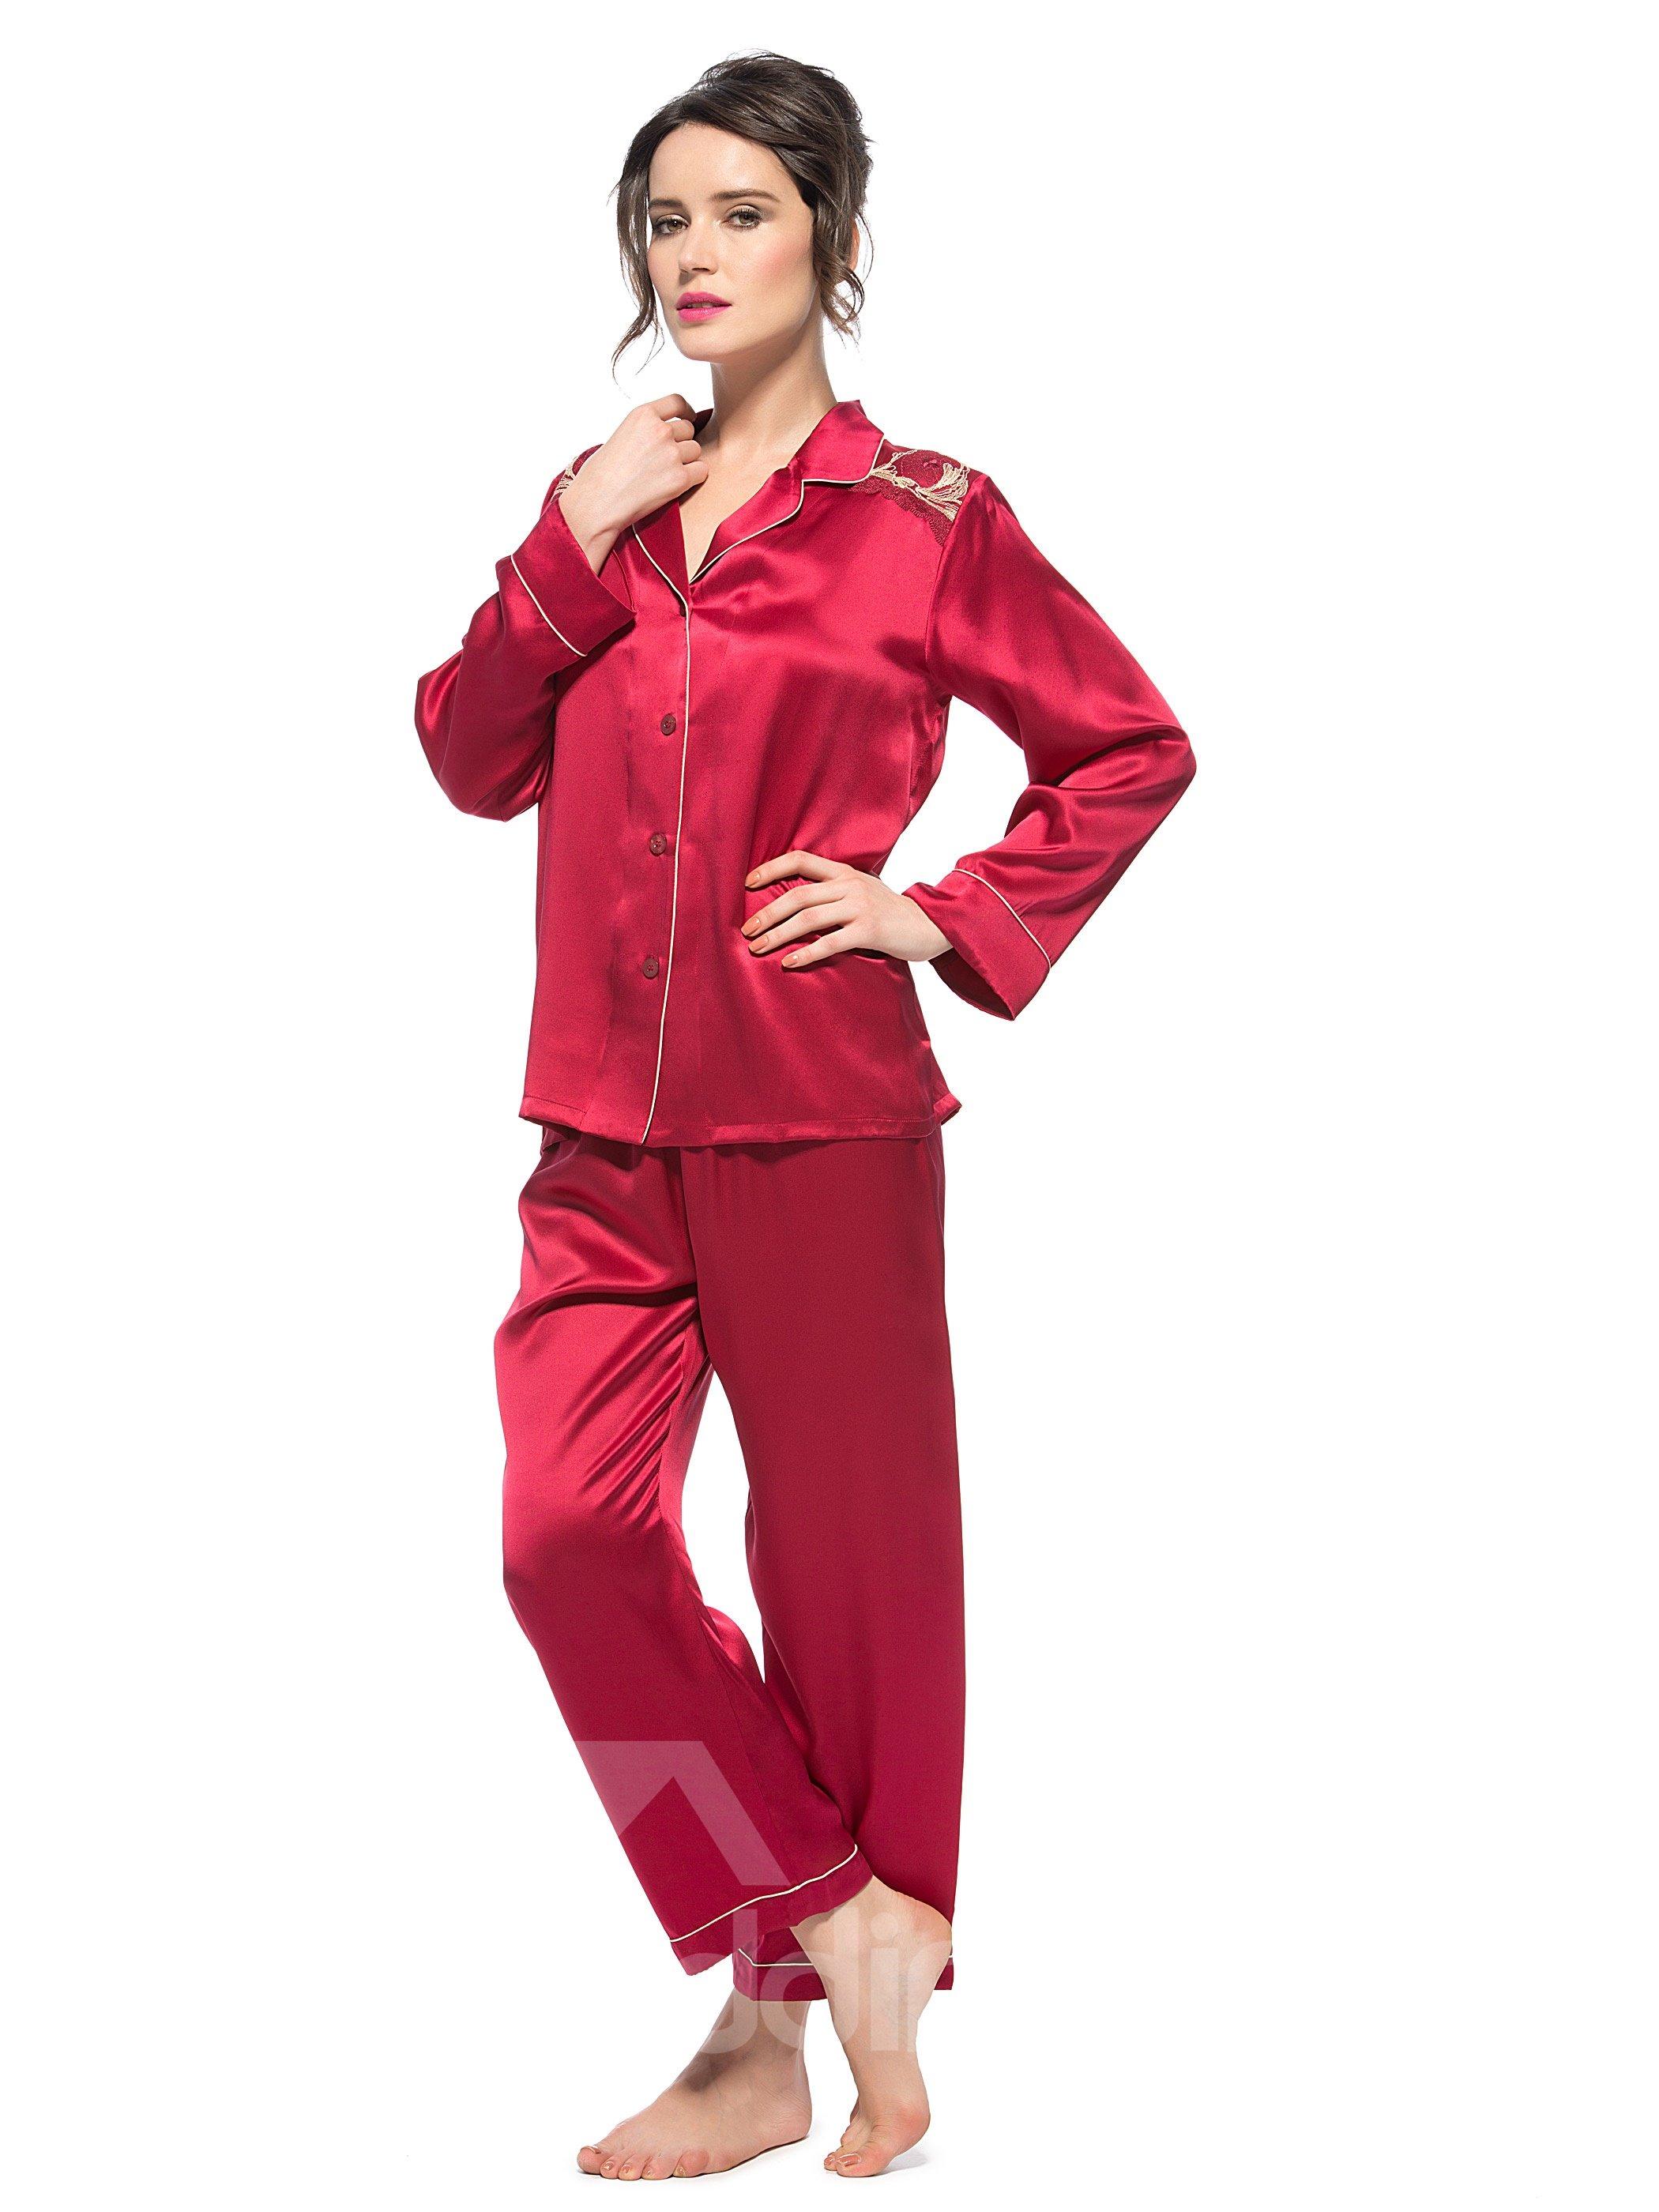 Wonderful Classic Top Quality Lace Closure Silk Pajamas